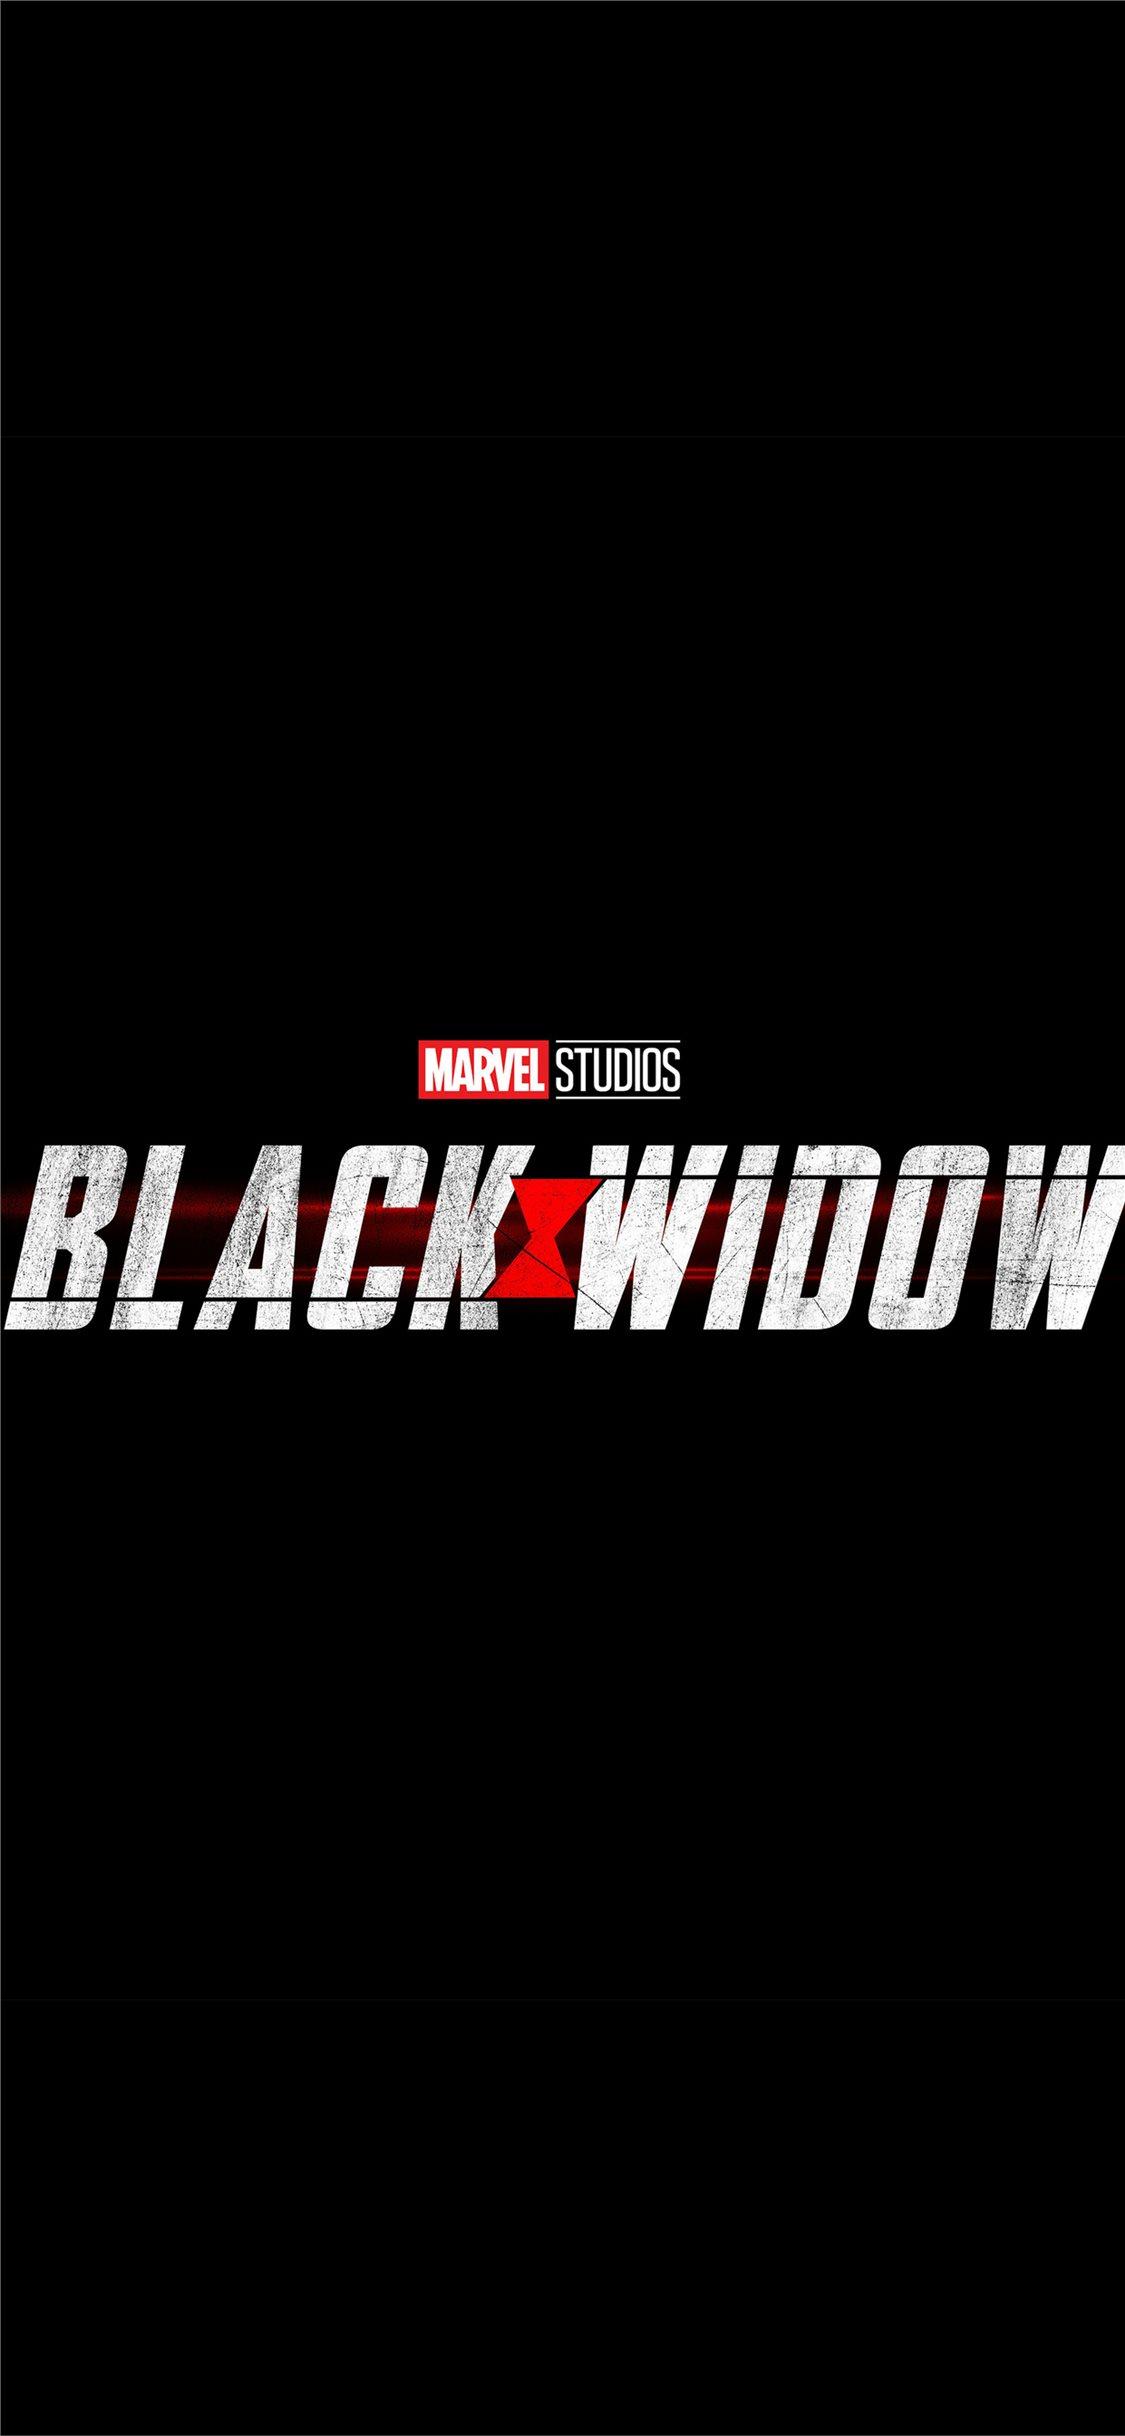 black widow 2020 movie iPhone X Wallpapers Download 1125x2436